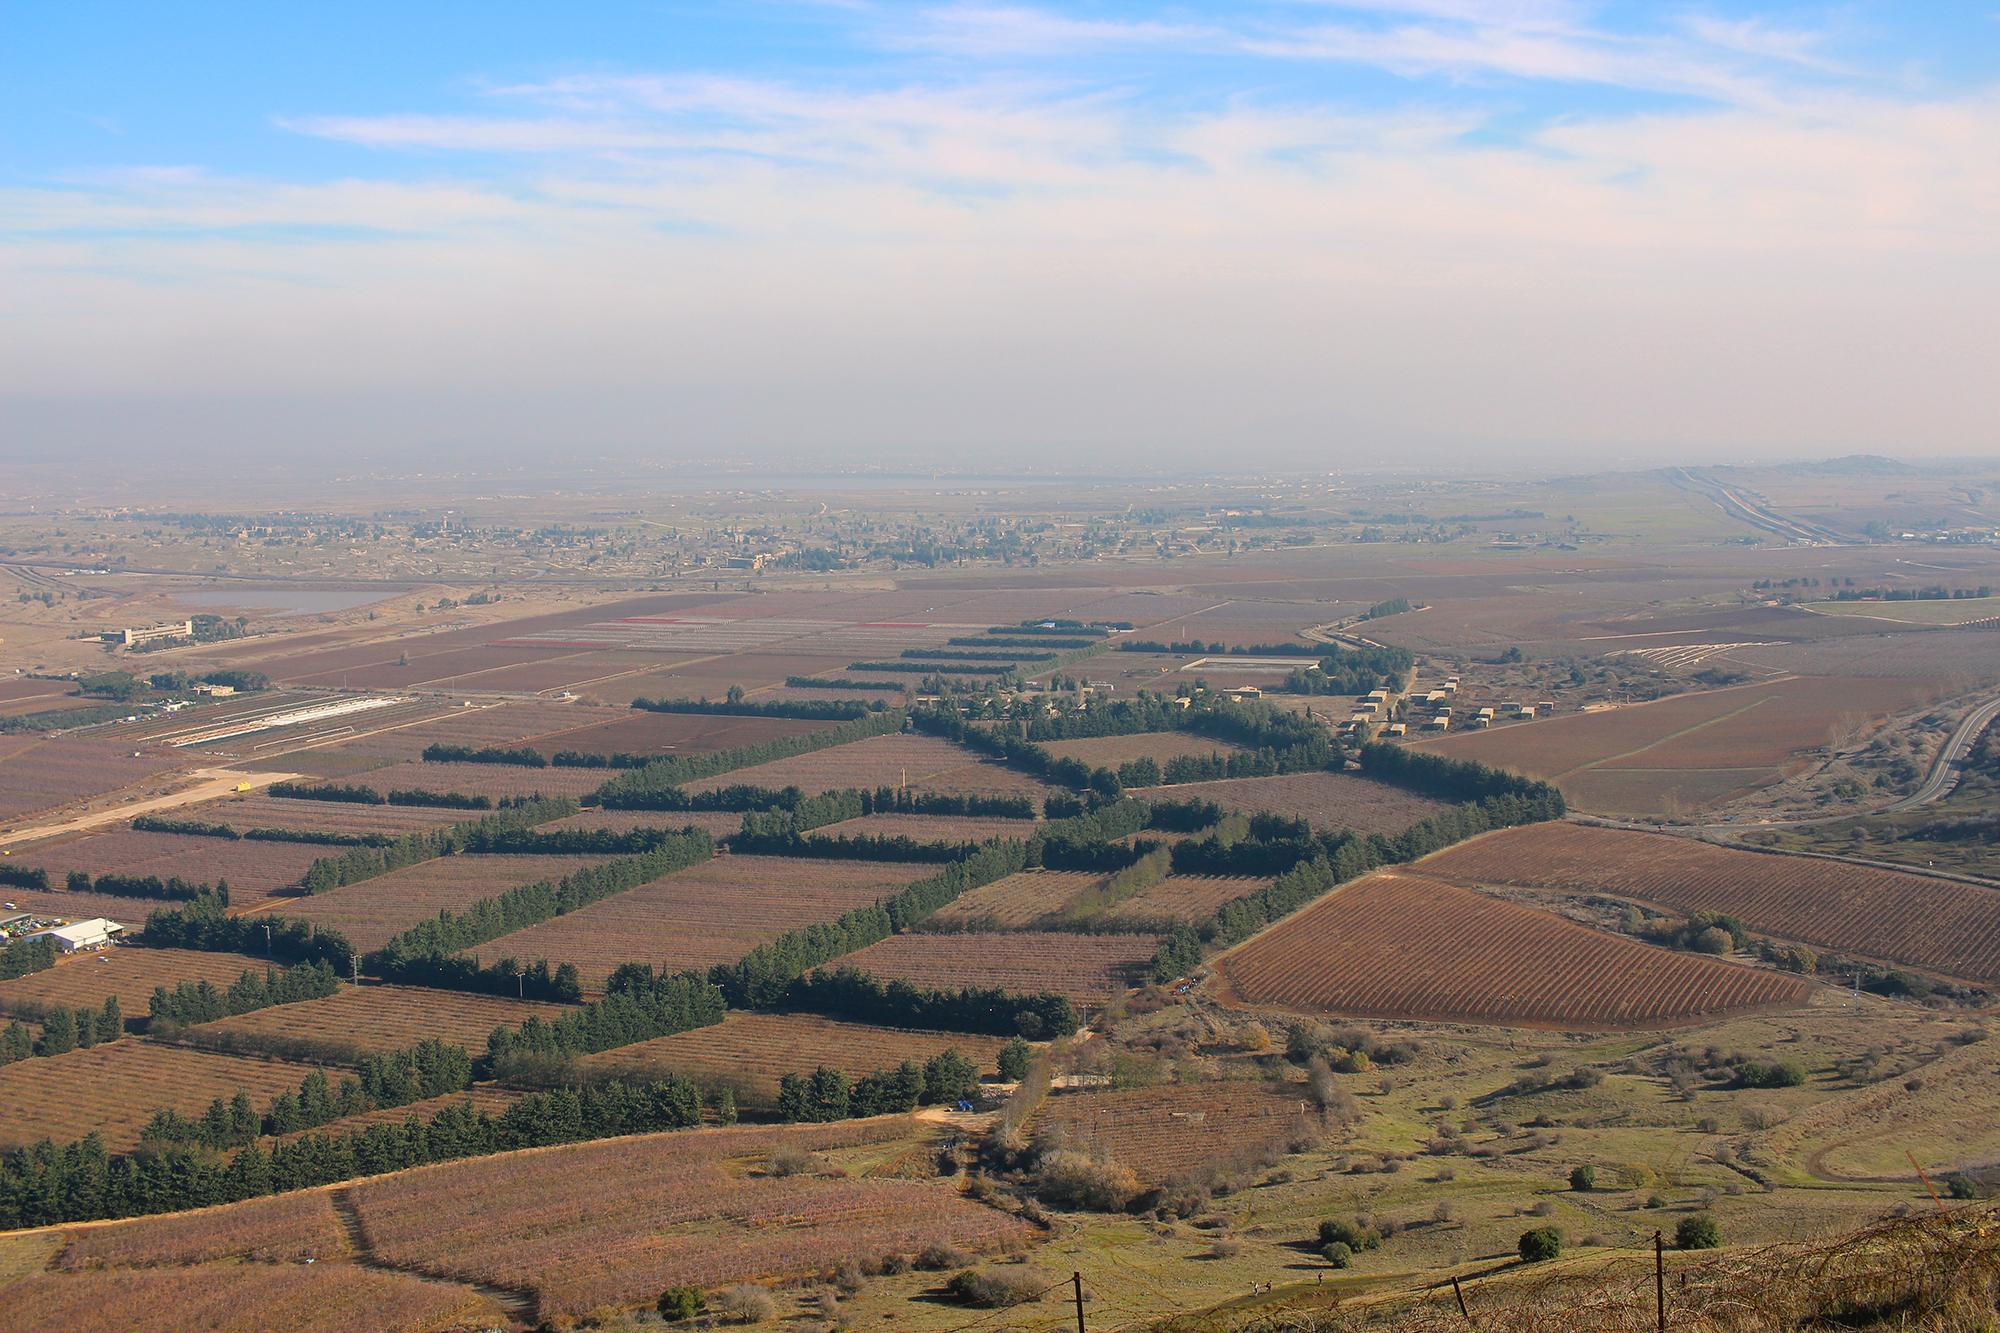 The view from Har Bental, Israeli Bunkers in Golan, Israel. View across Gamla in Golan Heights, Israel. Travel photography by Geena Matuson @geenamatuson #thegirlmirage.